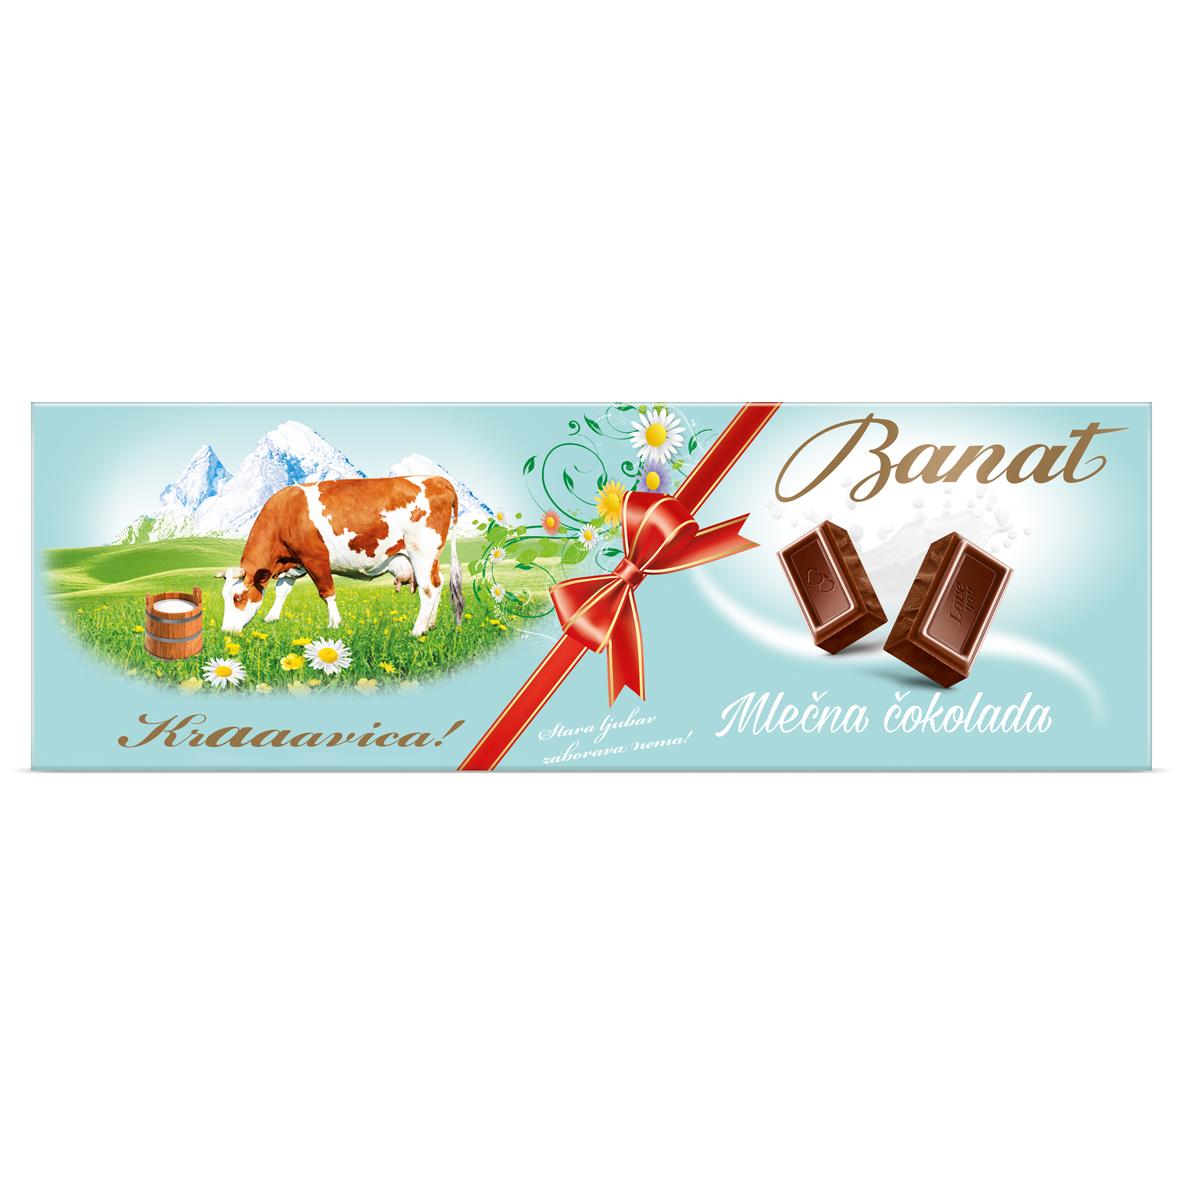 Banat cokolada